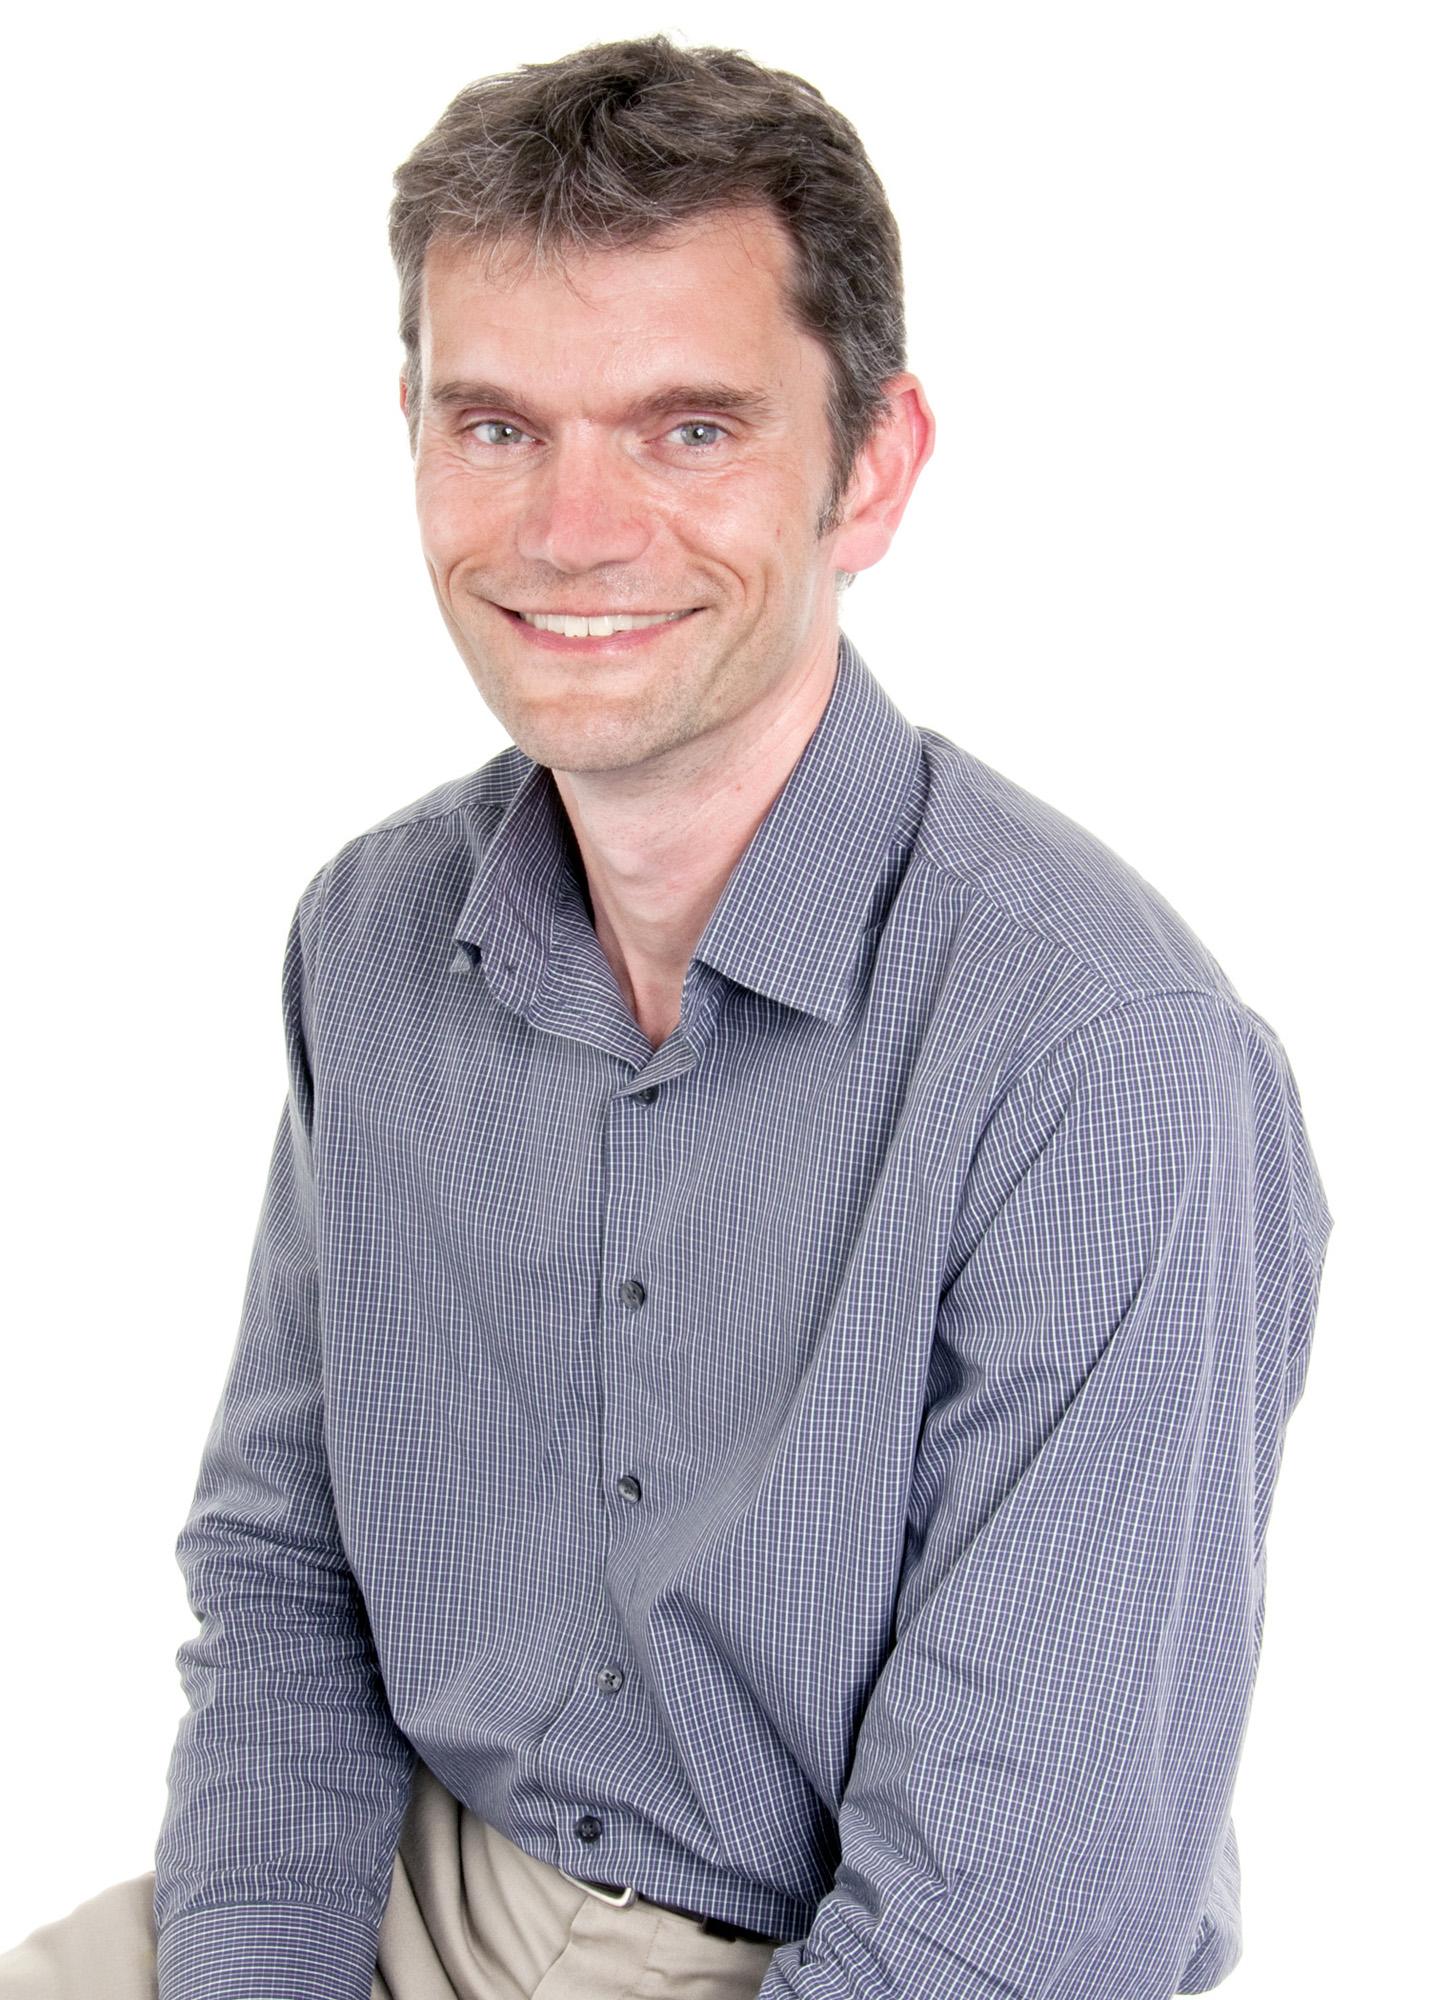 Tim G. Hales